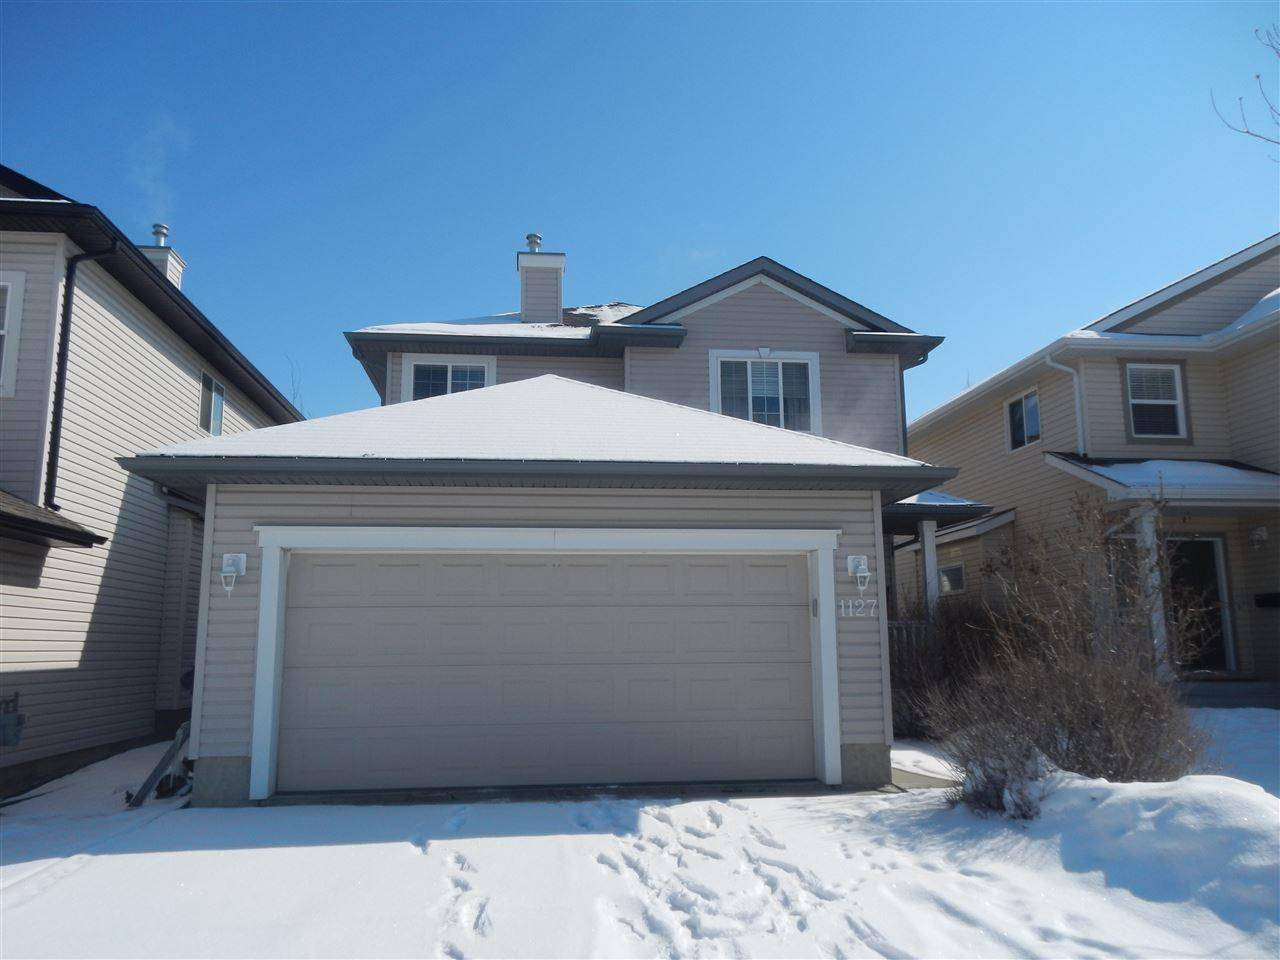 House for sale at 1127 Mcallister Ct Sw Edmonton Alberta - MLS: E4194101